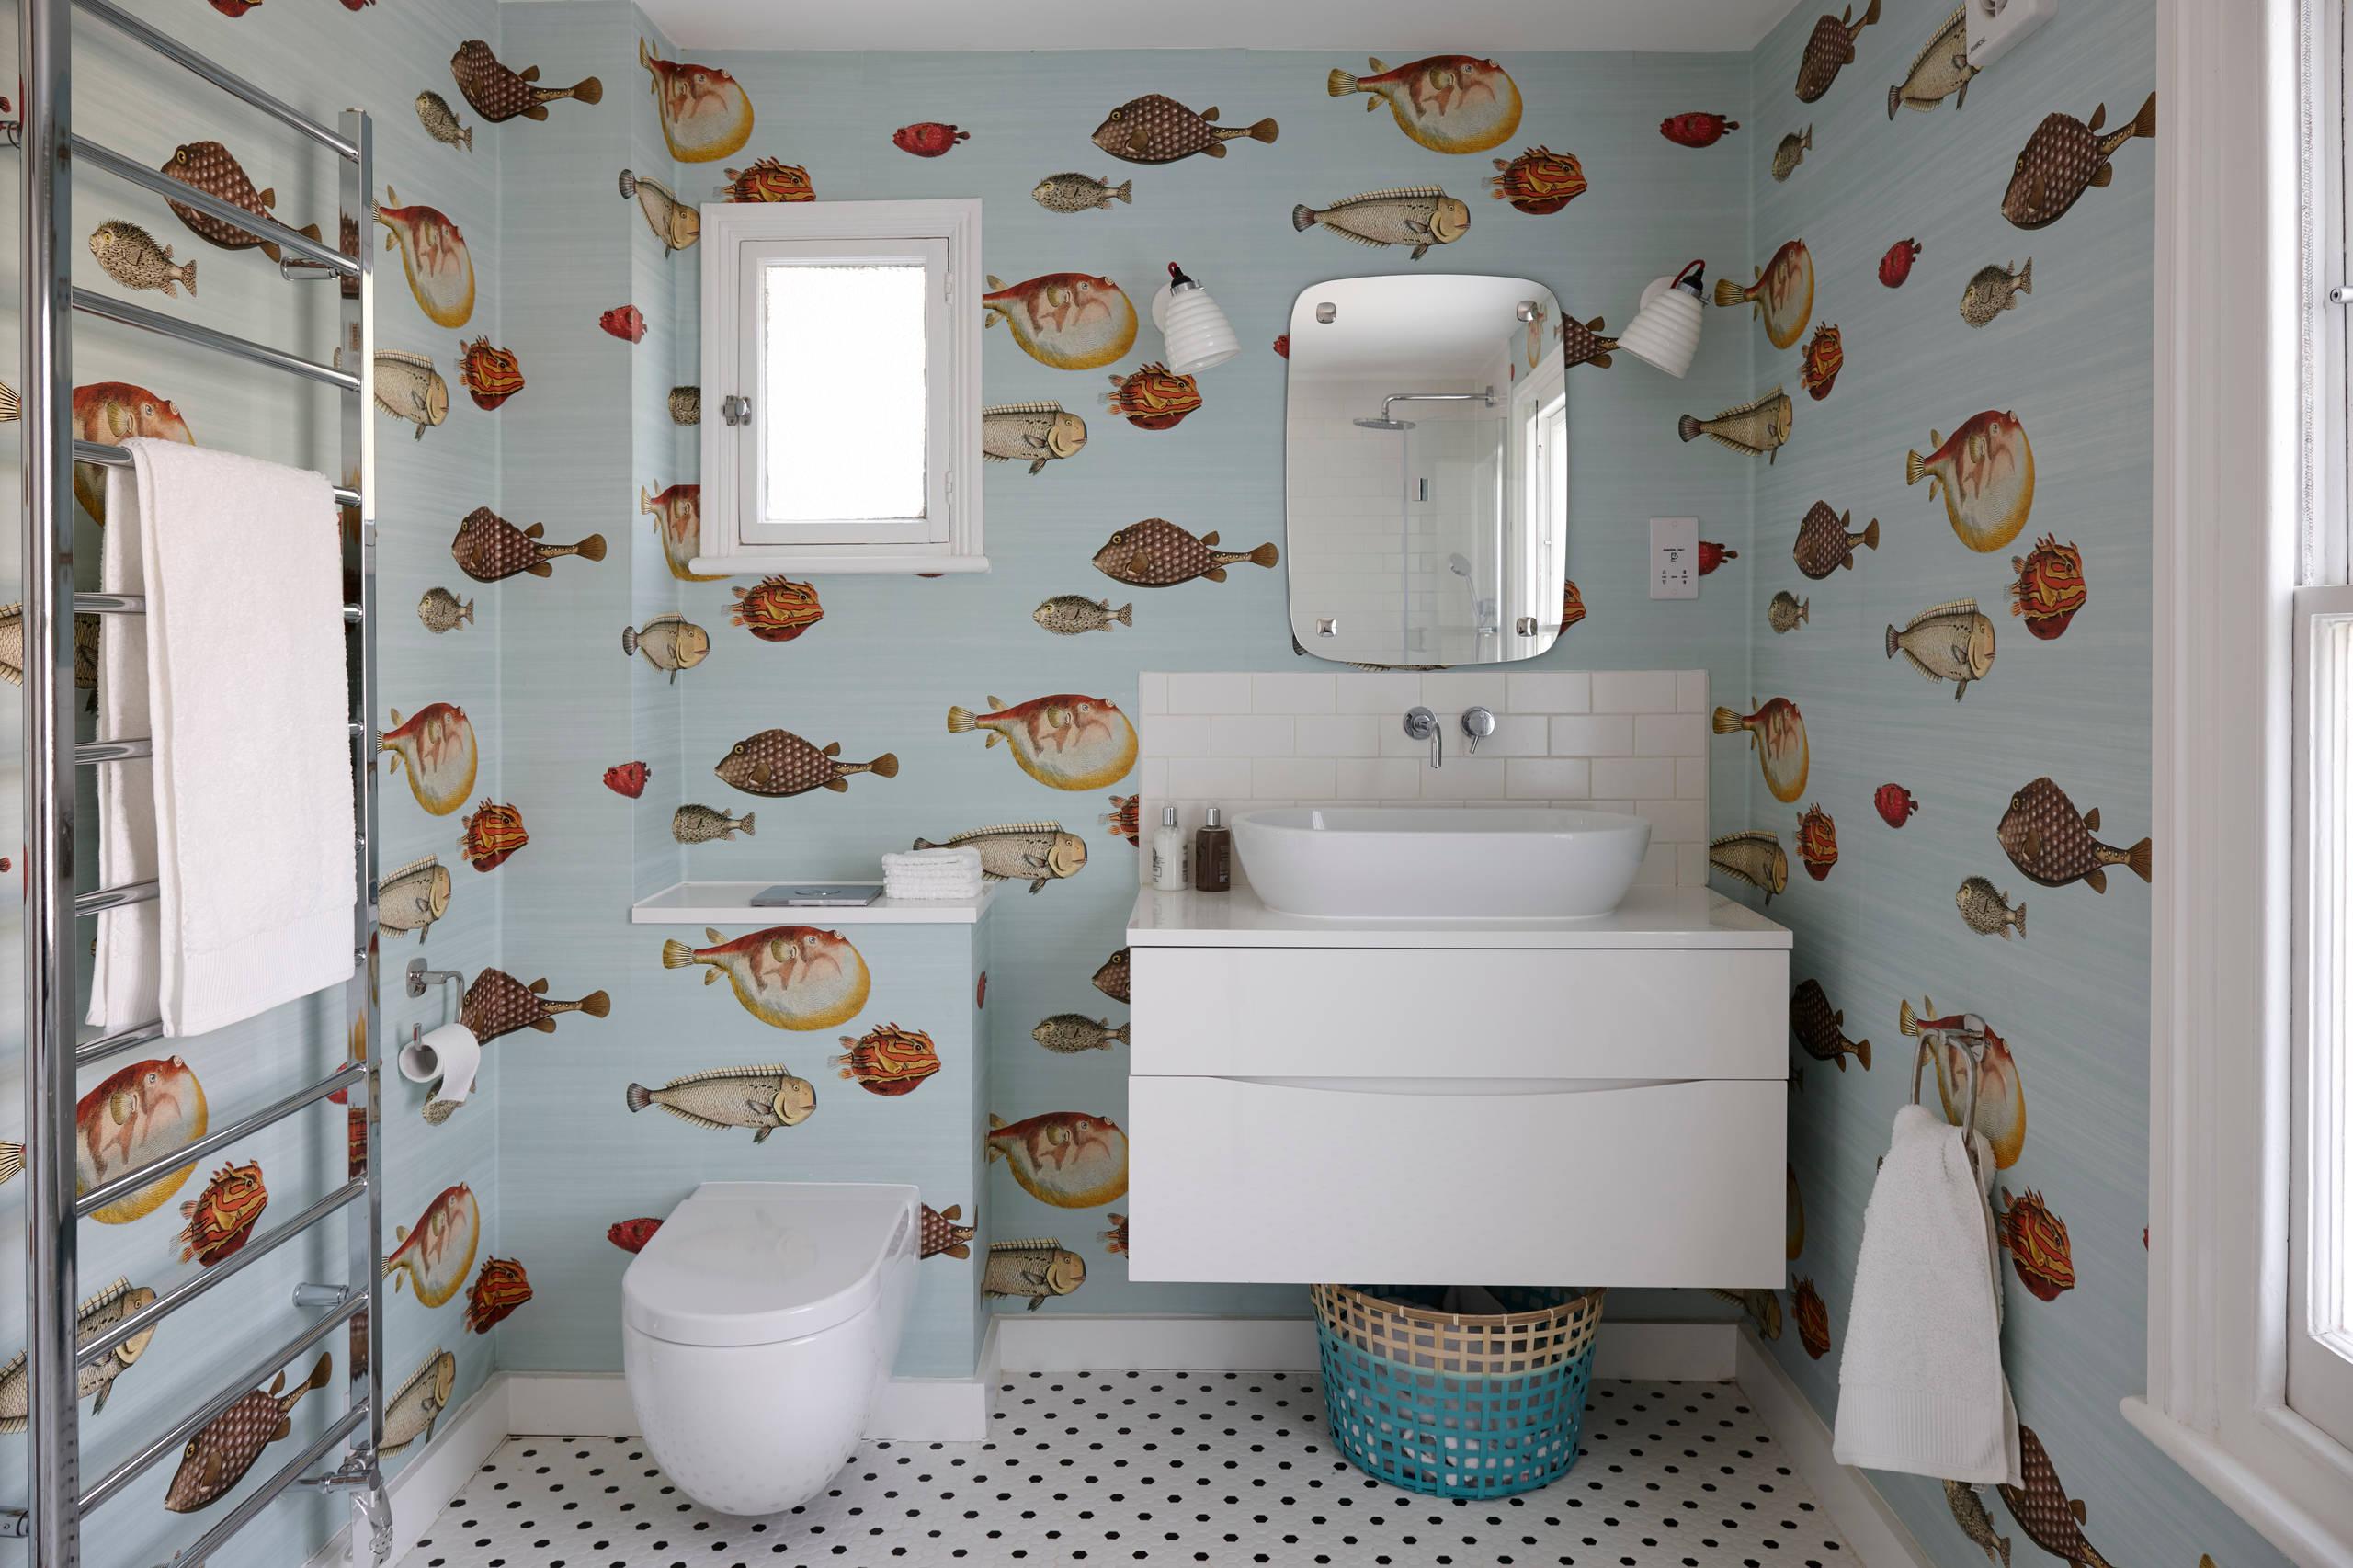 Fish Wallpaper Houzz, Fish Wallpaper For Bathroom